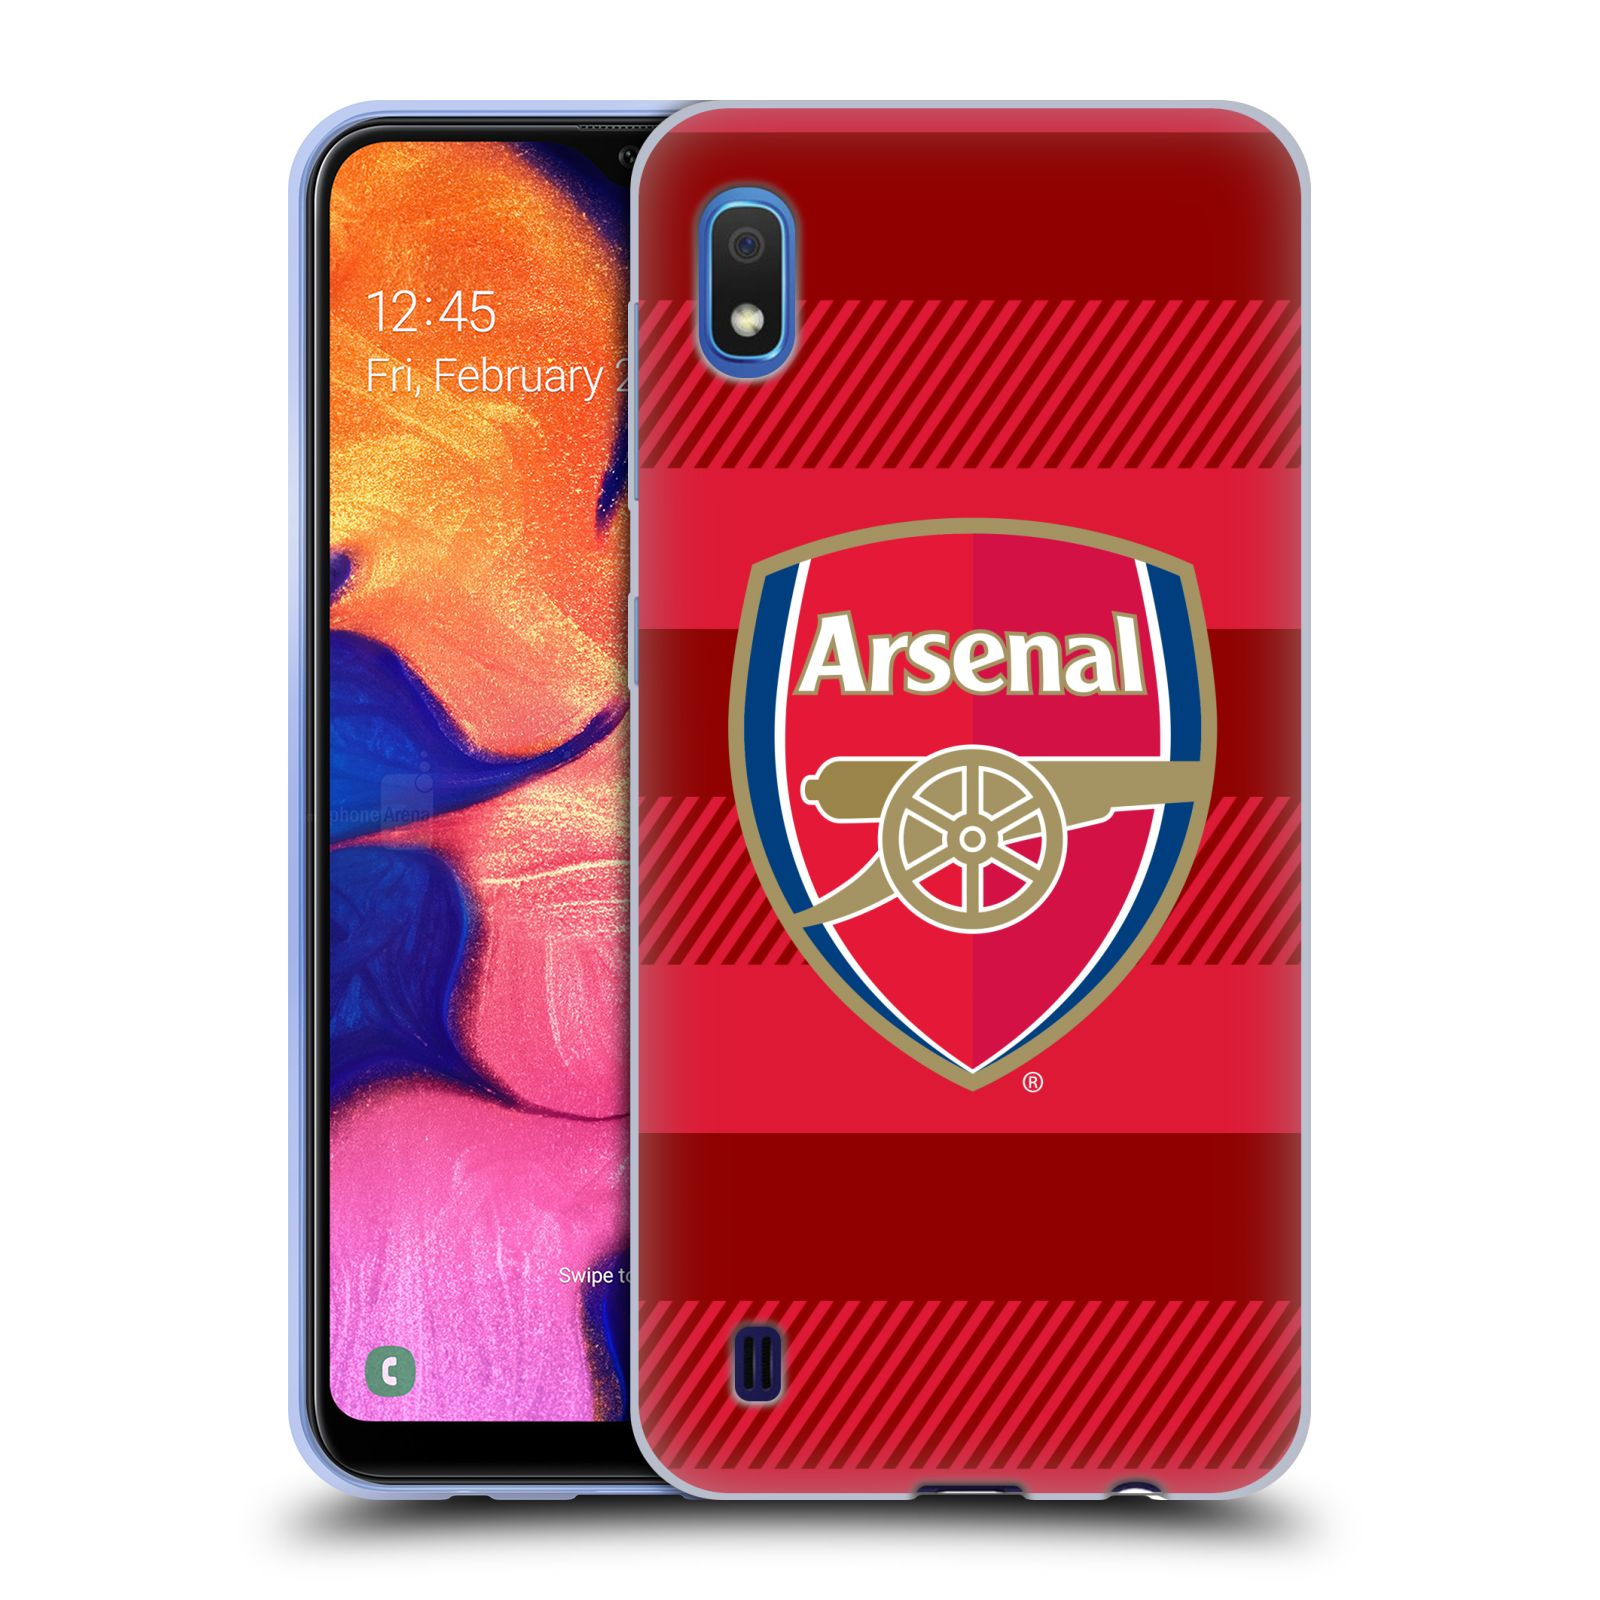 Silikonové pouzdro na mobil Samsung Galaxy A10 - Head Case - Arsenal FC - Logo s pruhy